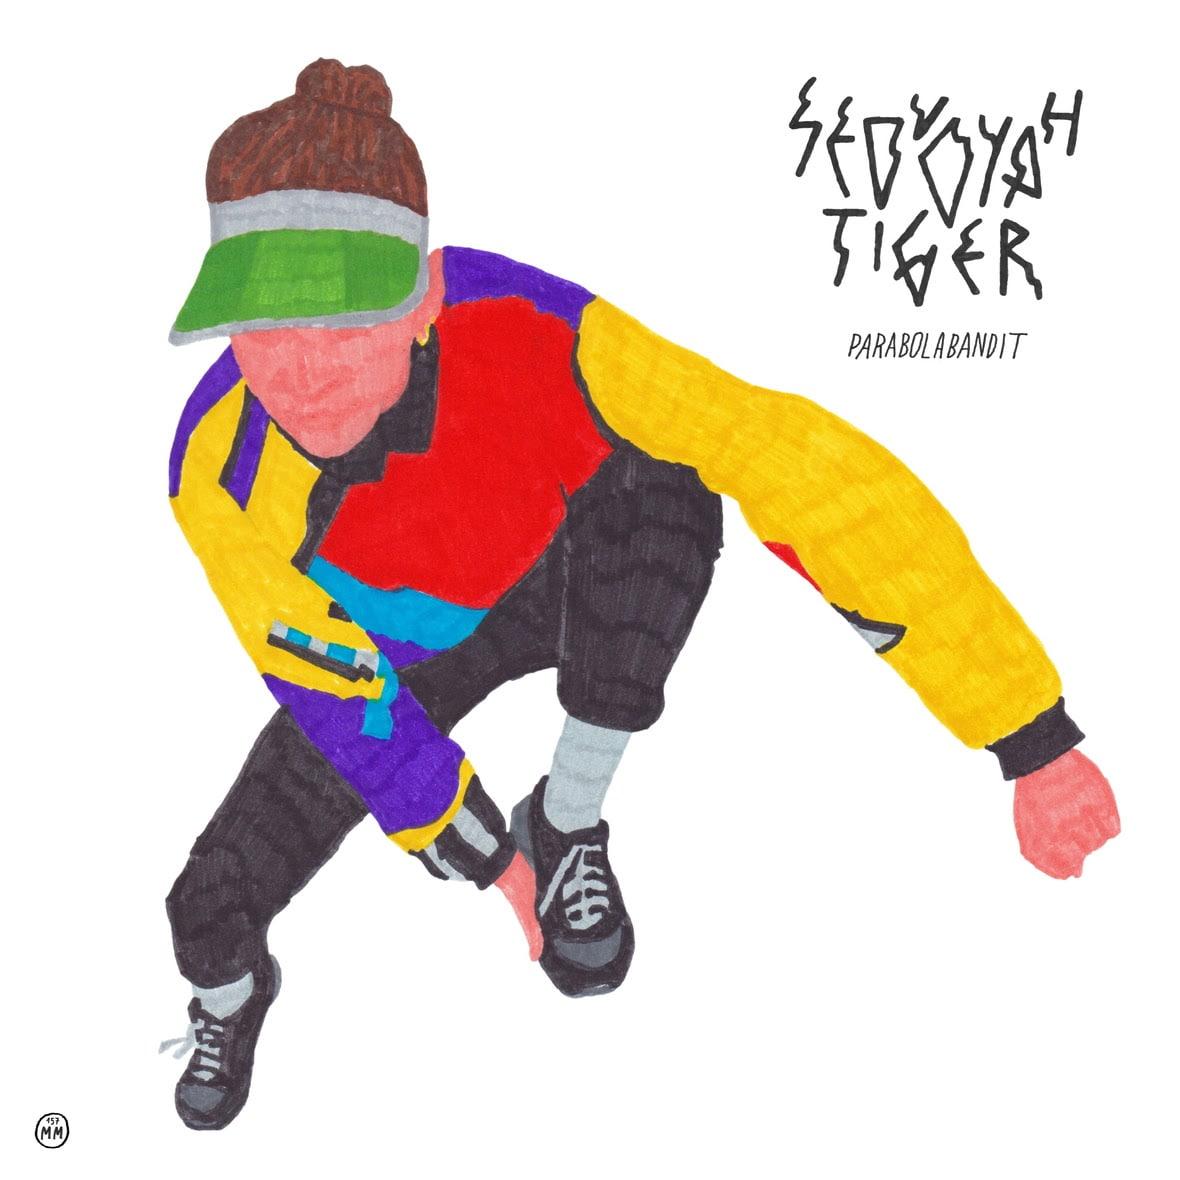 Photo of Sequoyah Tiger – Parabolabandit (Morr Music, 2017)